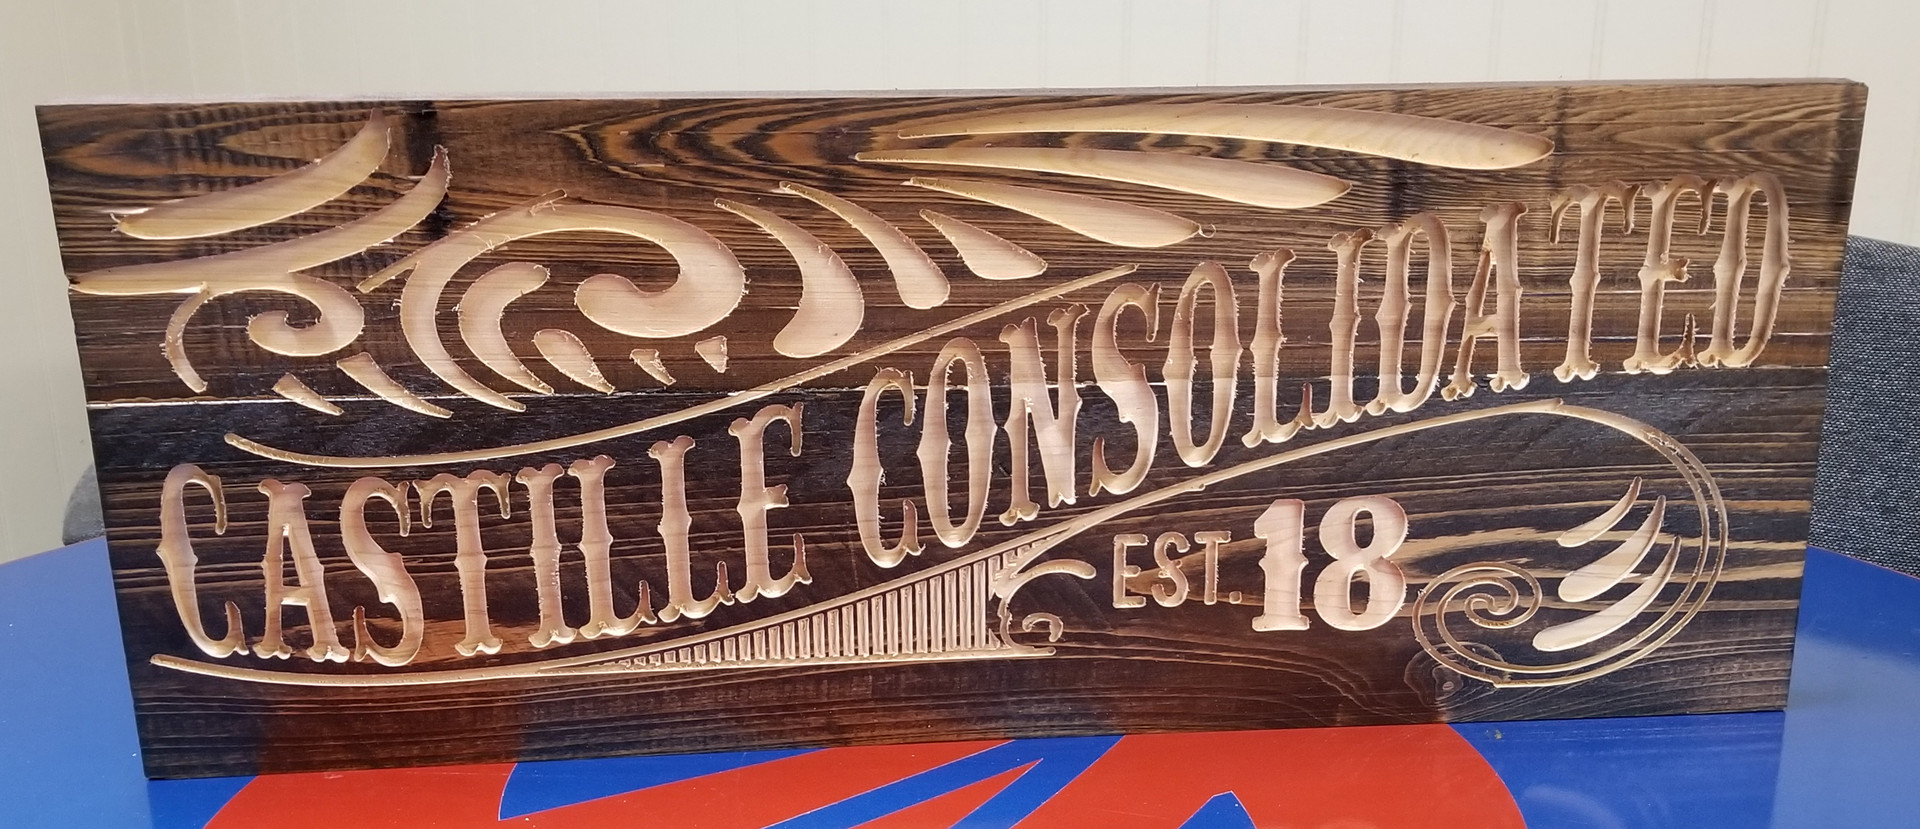 Sidelines (Castille Consolidated)-2.jpg